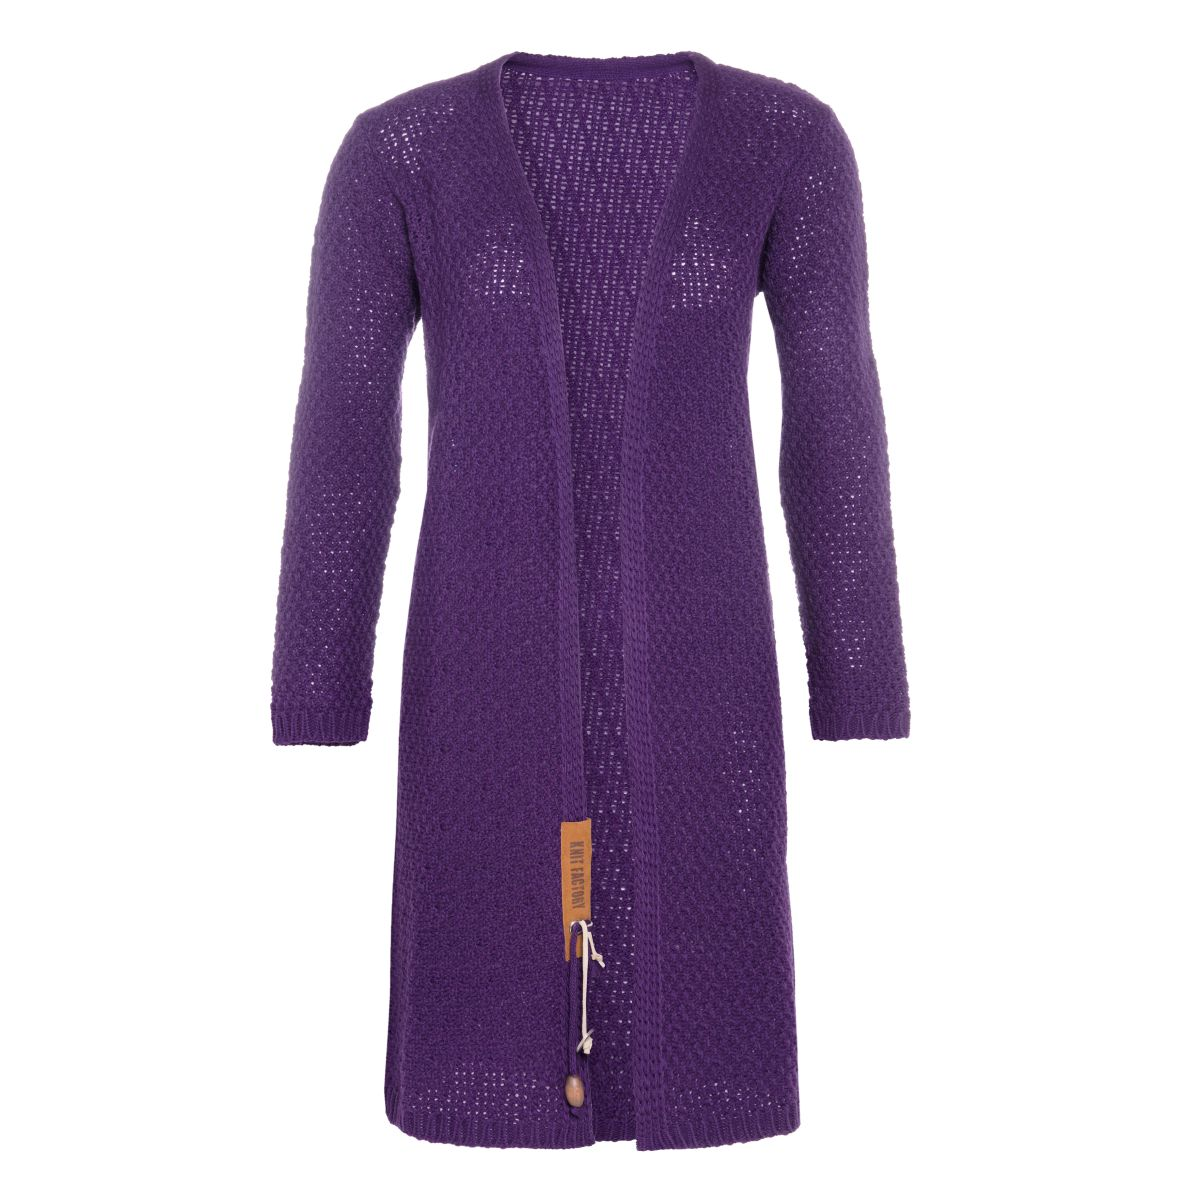 knit factory kf13308212349 luna vest purple 3638 1